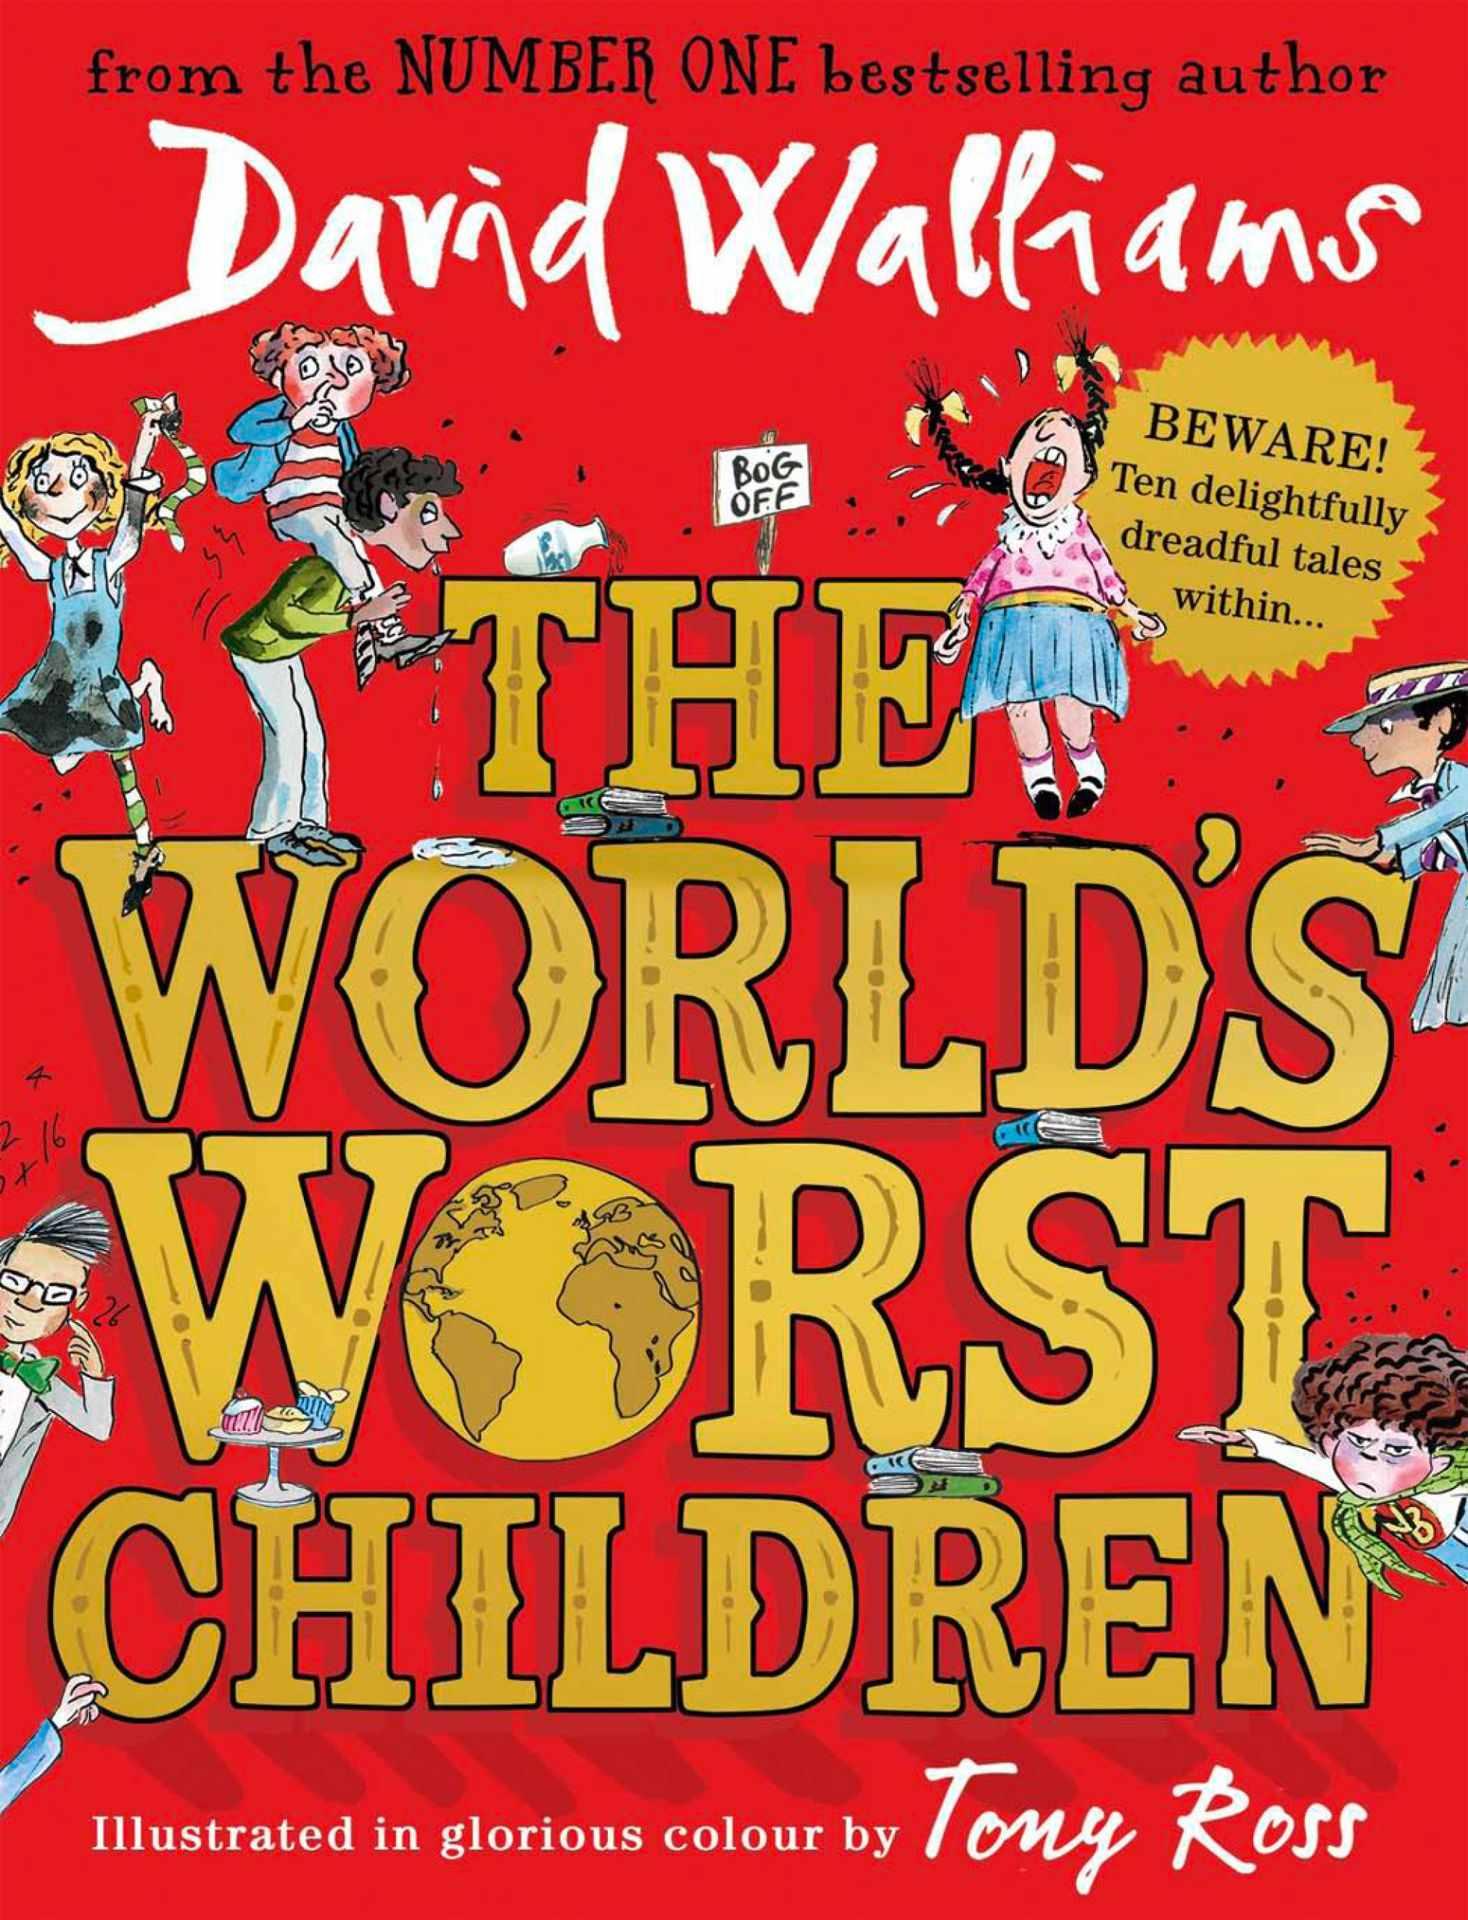 The world's worst children 1,2 or 3 Hardback £5.99 each (Prime) / £8.98 (non Prime) at Amazon